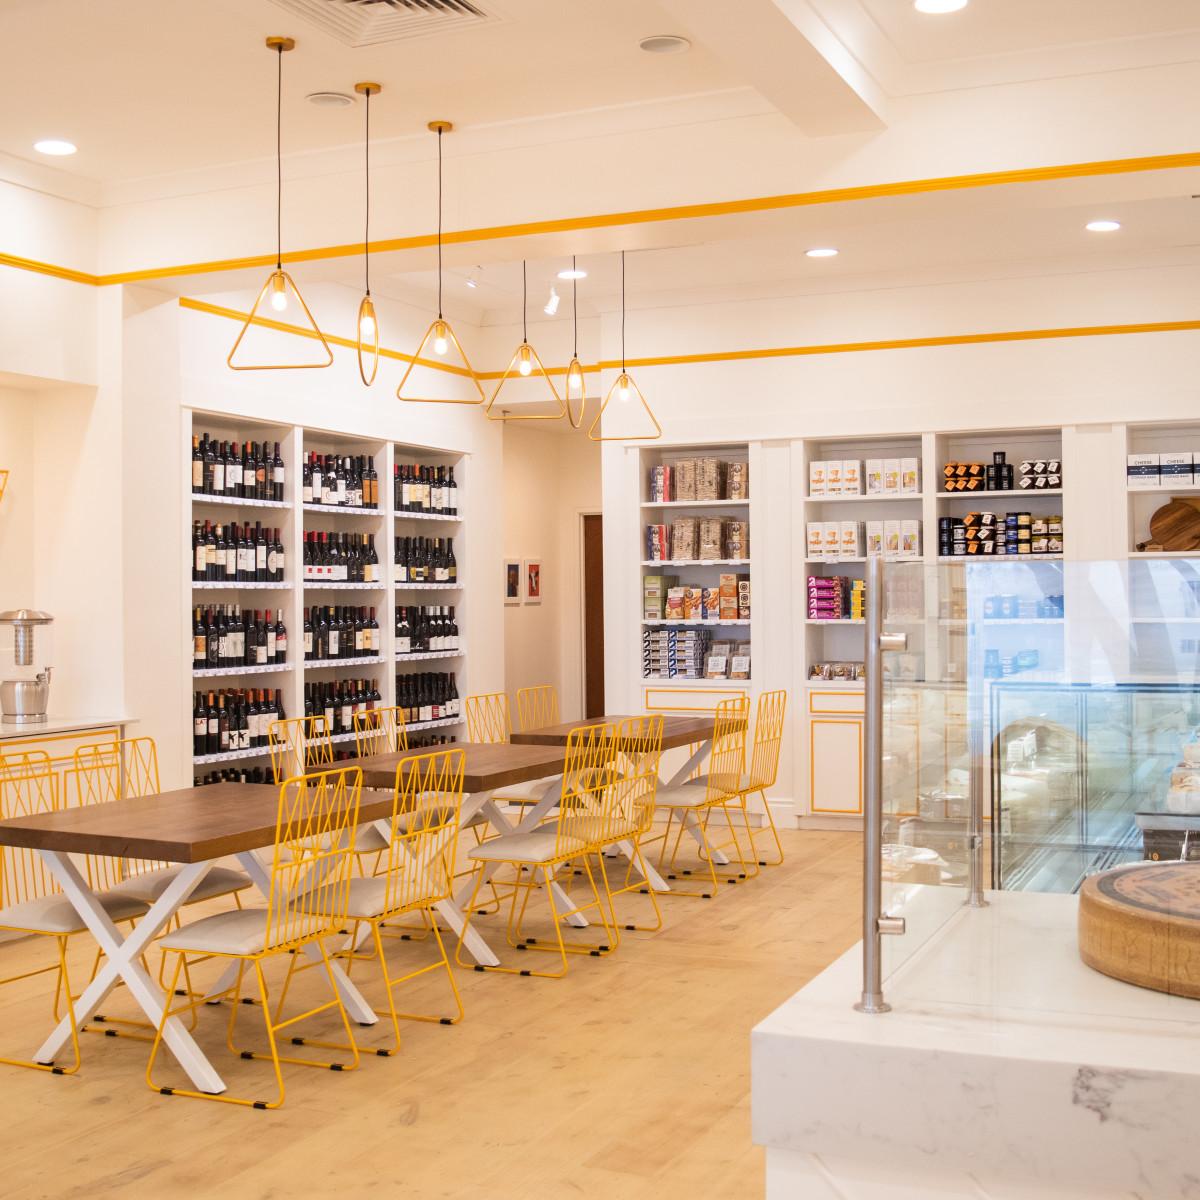 Austin Cheese Co. interior wide